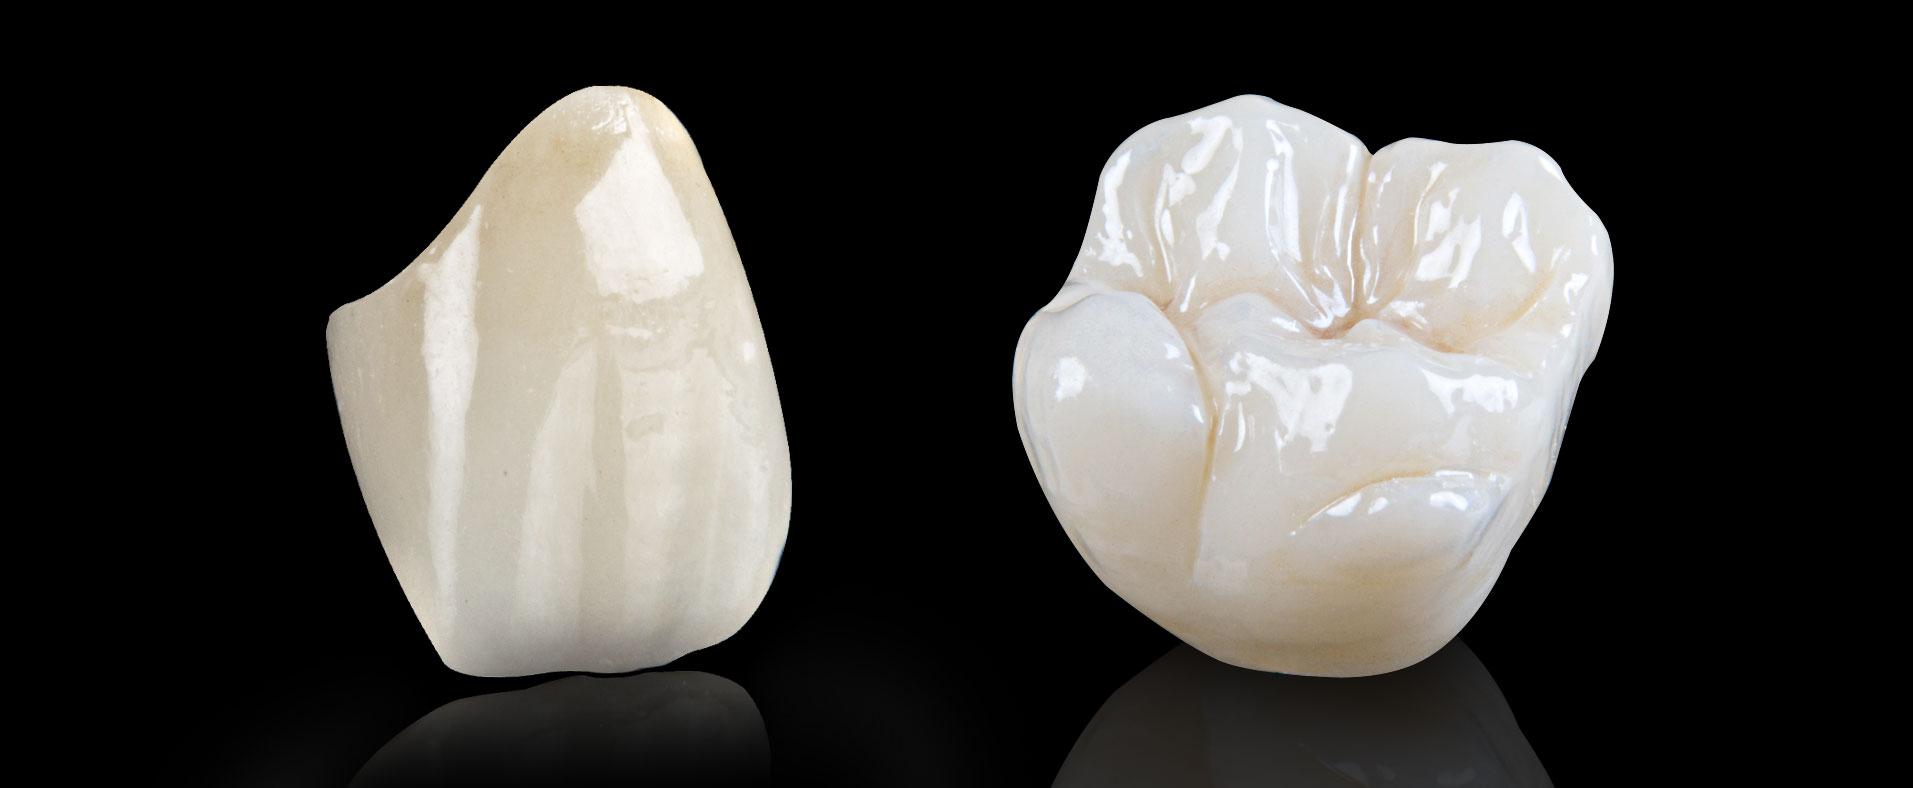 toan-su-implant-artdent-nha-khoa